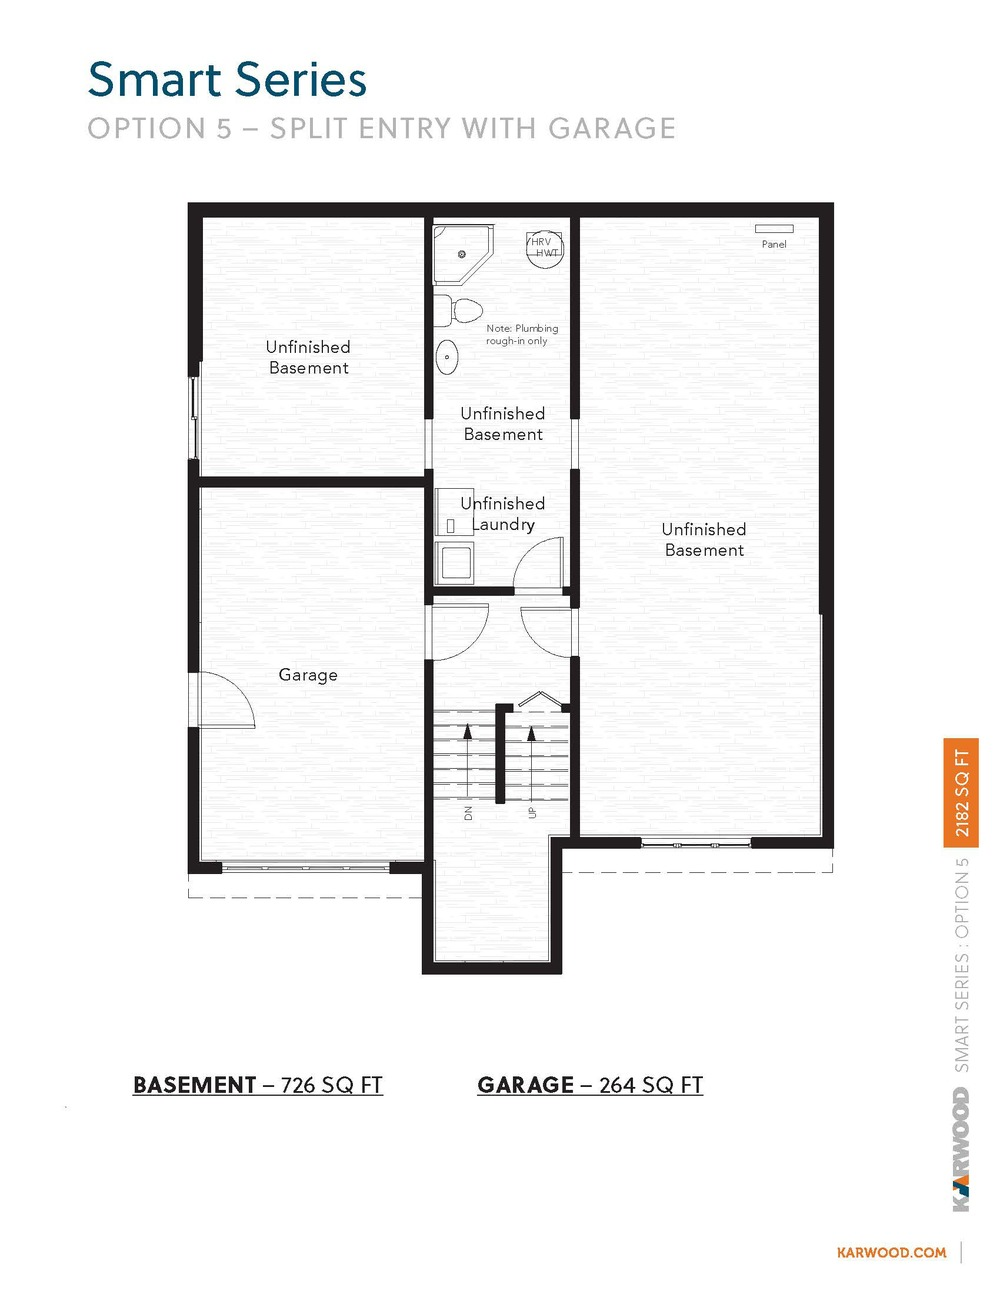 Option5-SplitEntryGarage-SmartSeries-Plans_Page_2.jpg